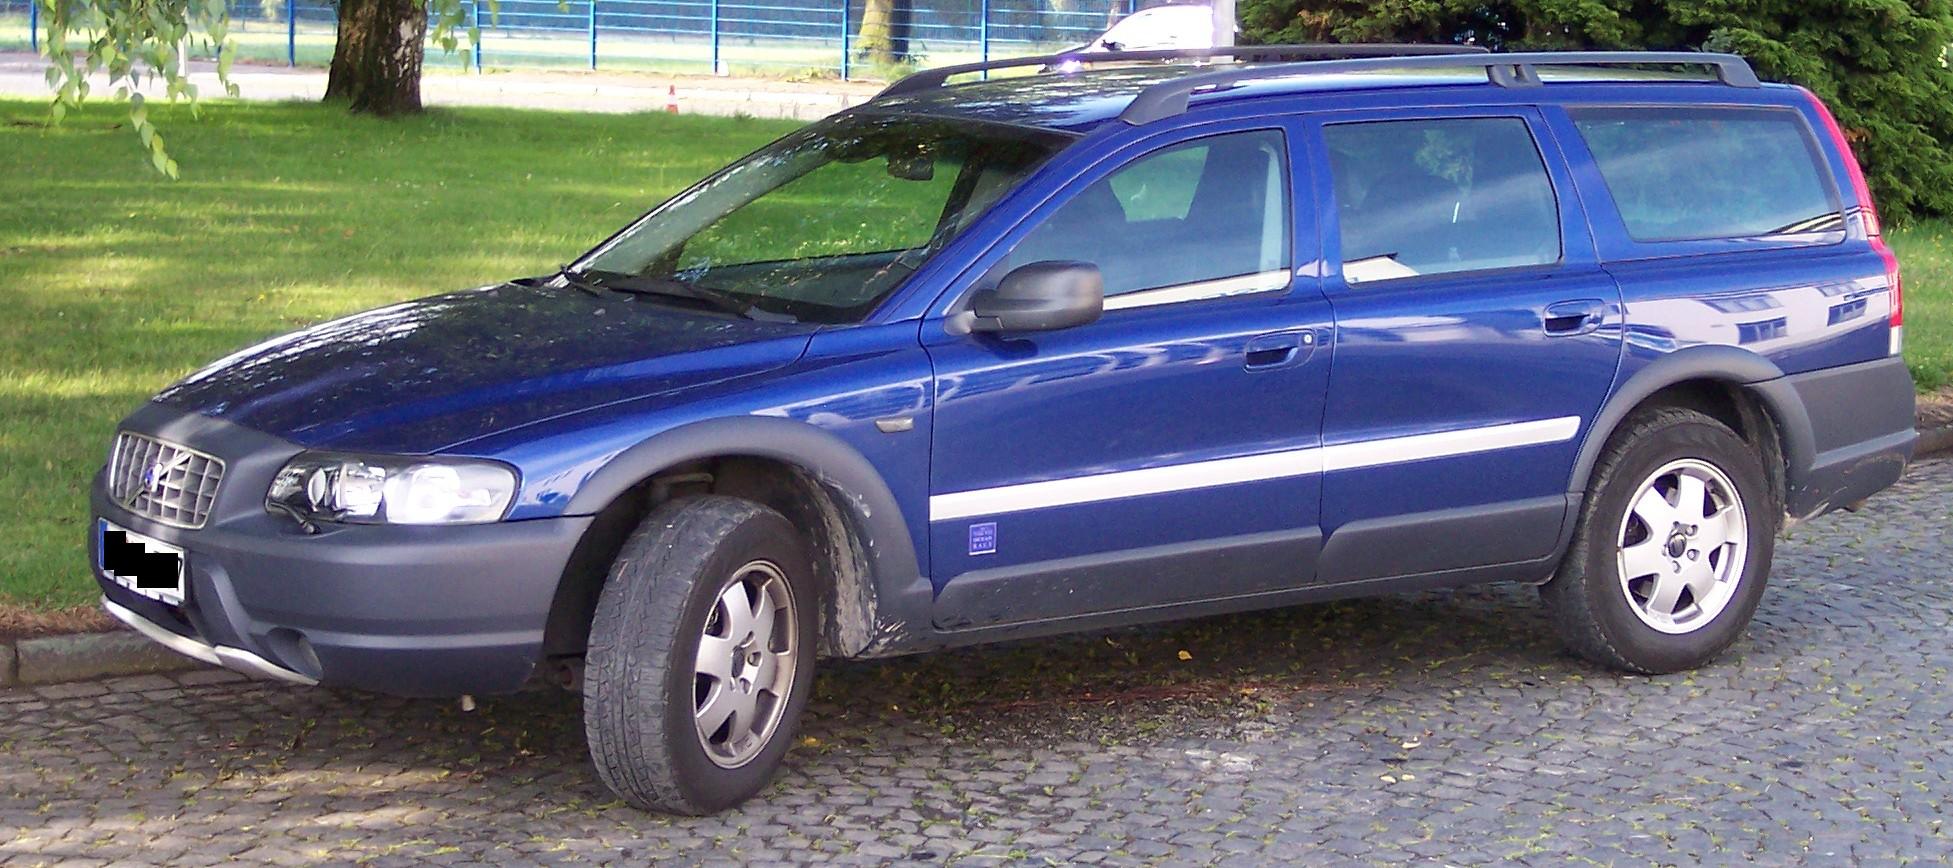 VOLVO XC 70 blue